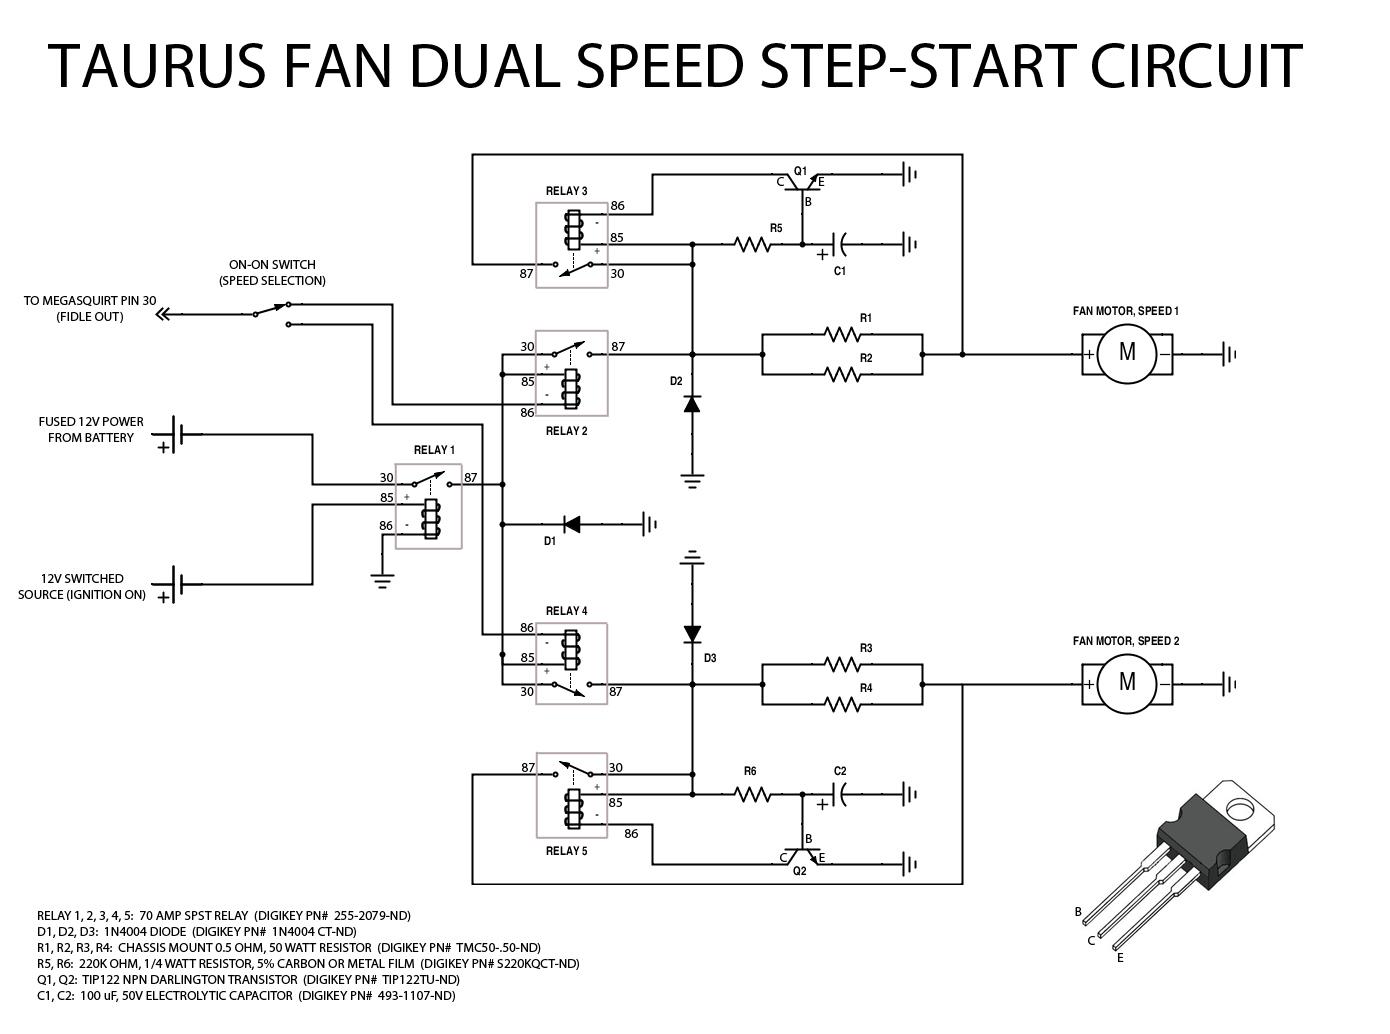 Hunter Pump Start Relay Wiring Diagram Transistors Basic 12v Step Start Circuit For Automotive